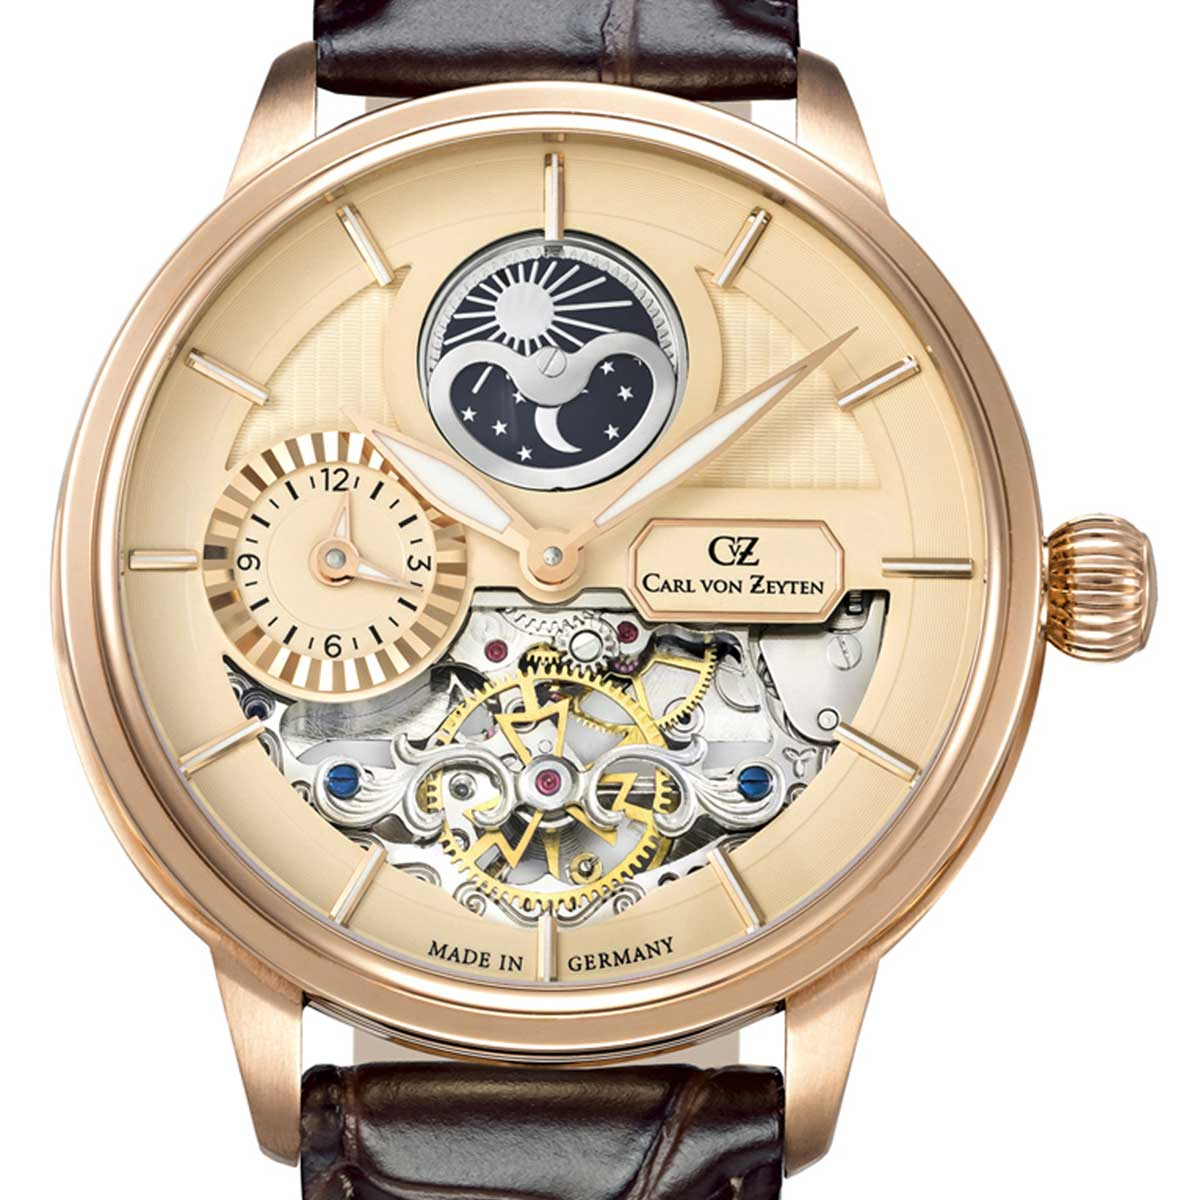 Carl von Zeyten カール・フォン・ツォイテン 自動巻き(手巻き機能あり) 腕時計 [CvZ0048RG] 正規代理店品  デイ&ナイト(サン&ムーン) GMT(ワールドタイム)